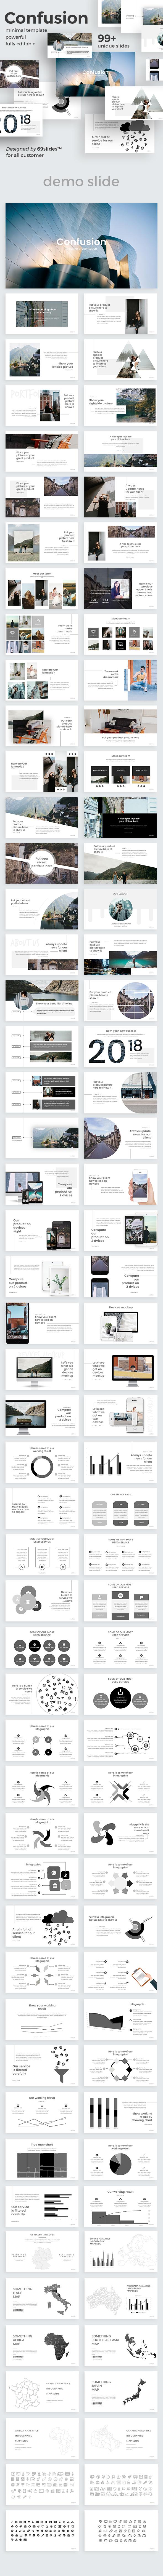 Confusion Creative Google Slide Template - Google Slides Presentation Templates